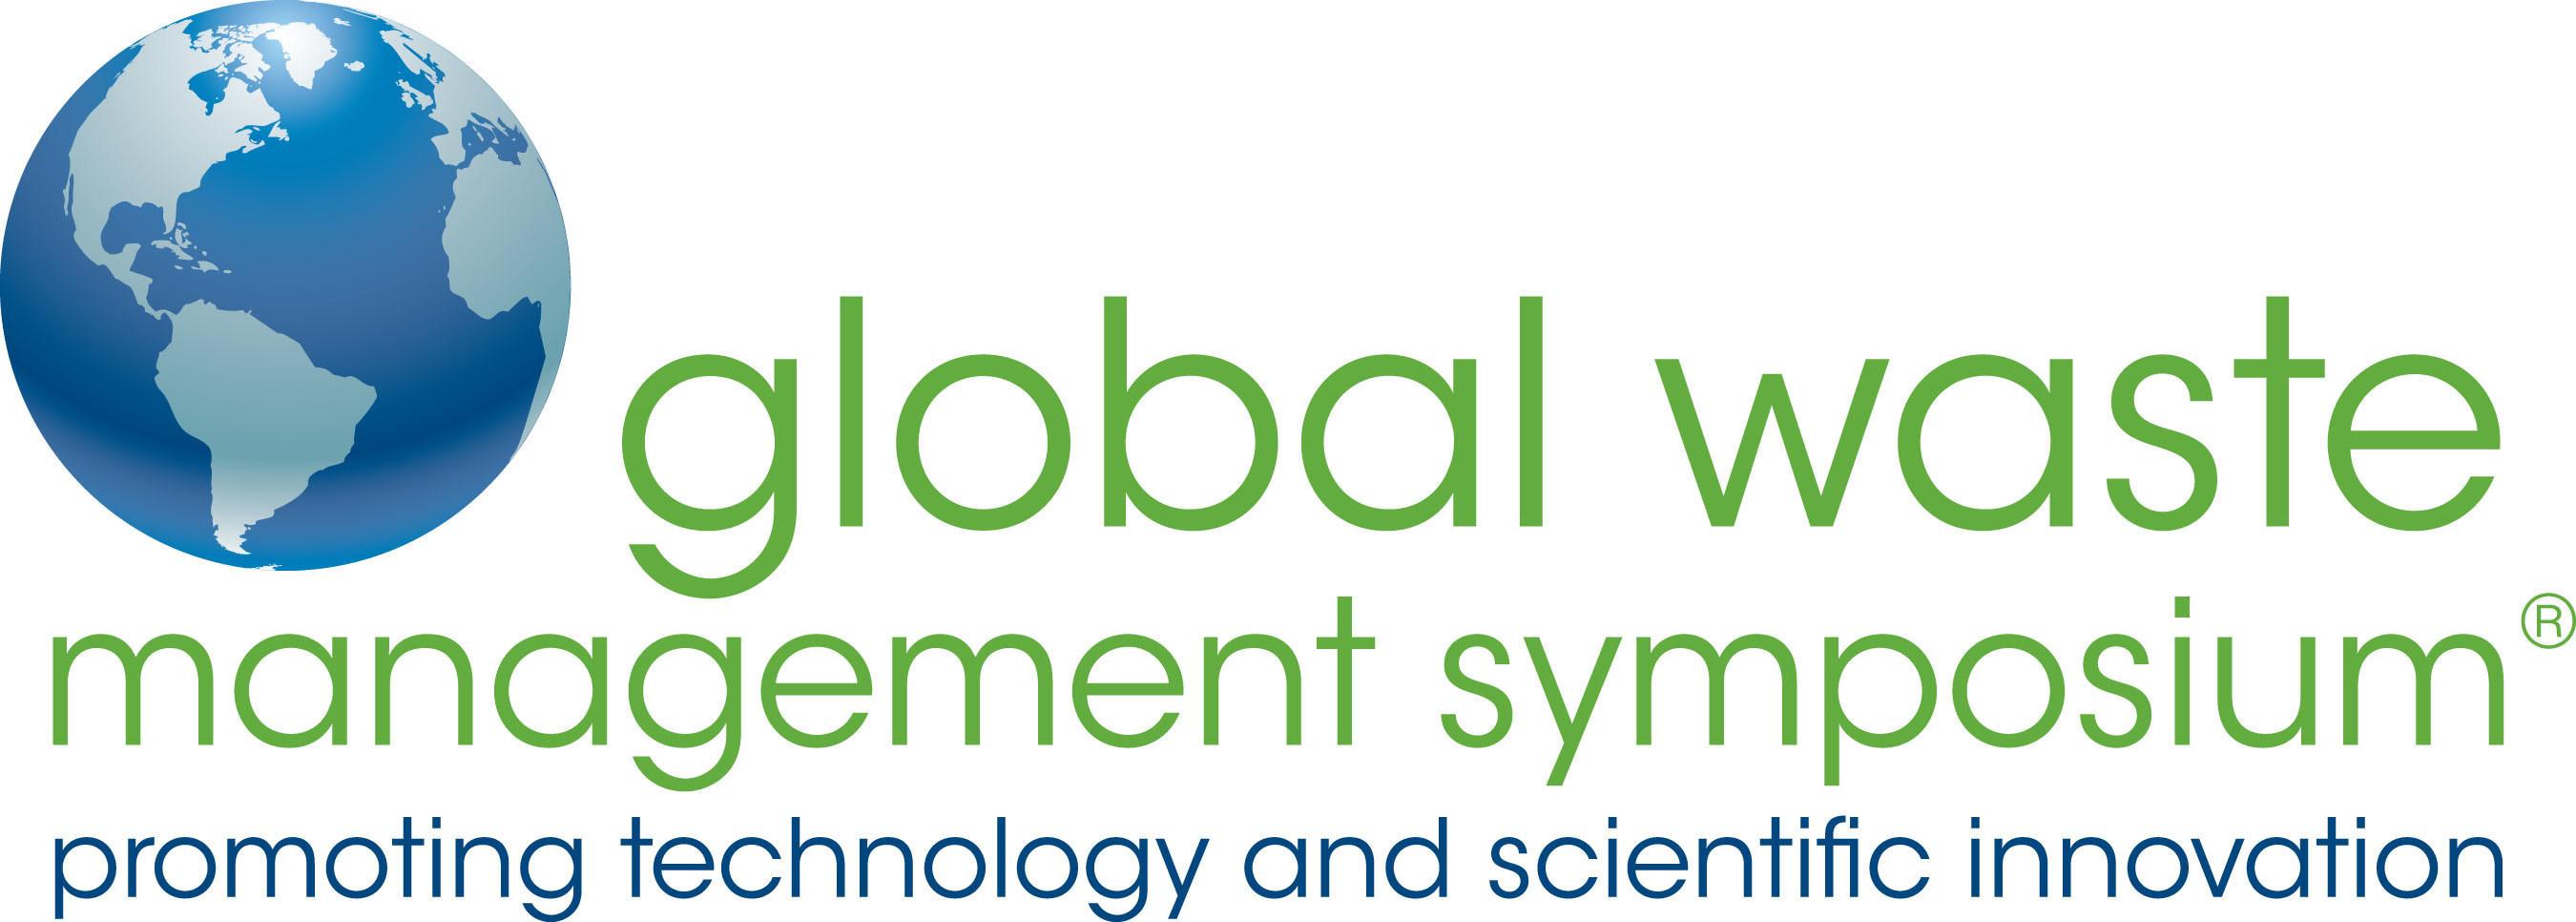 2014 Awards Winners Global Waste Mgmnt Symposium (PRNewsFoto/Penton)